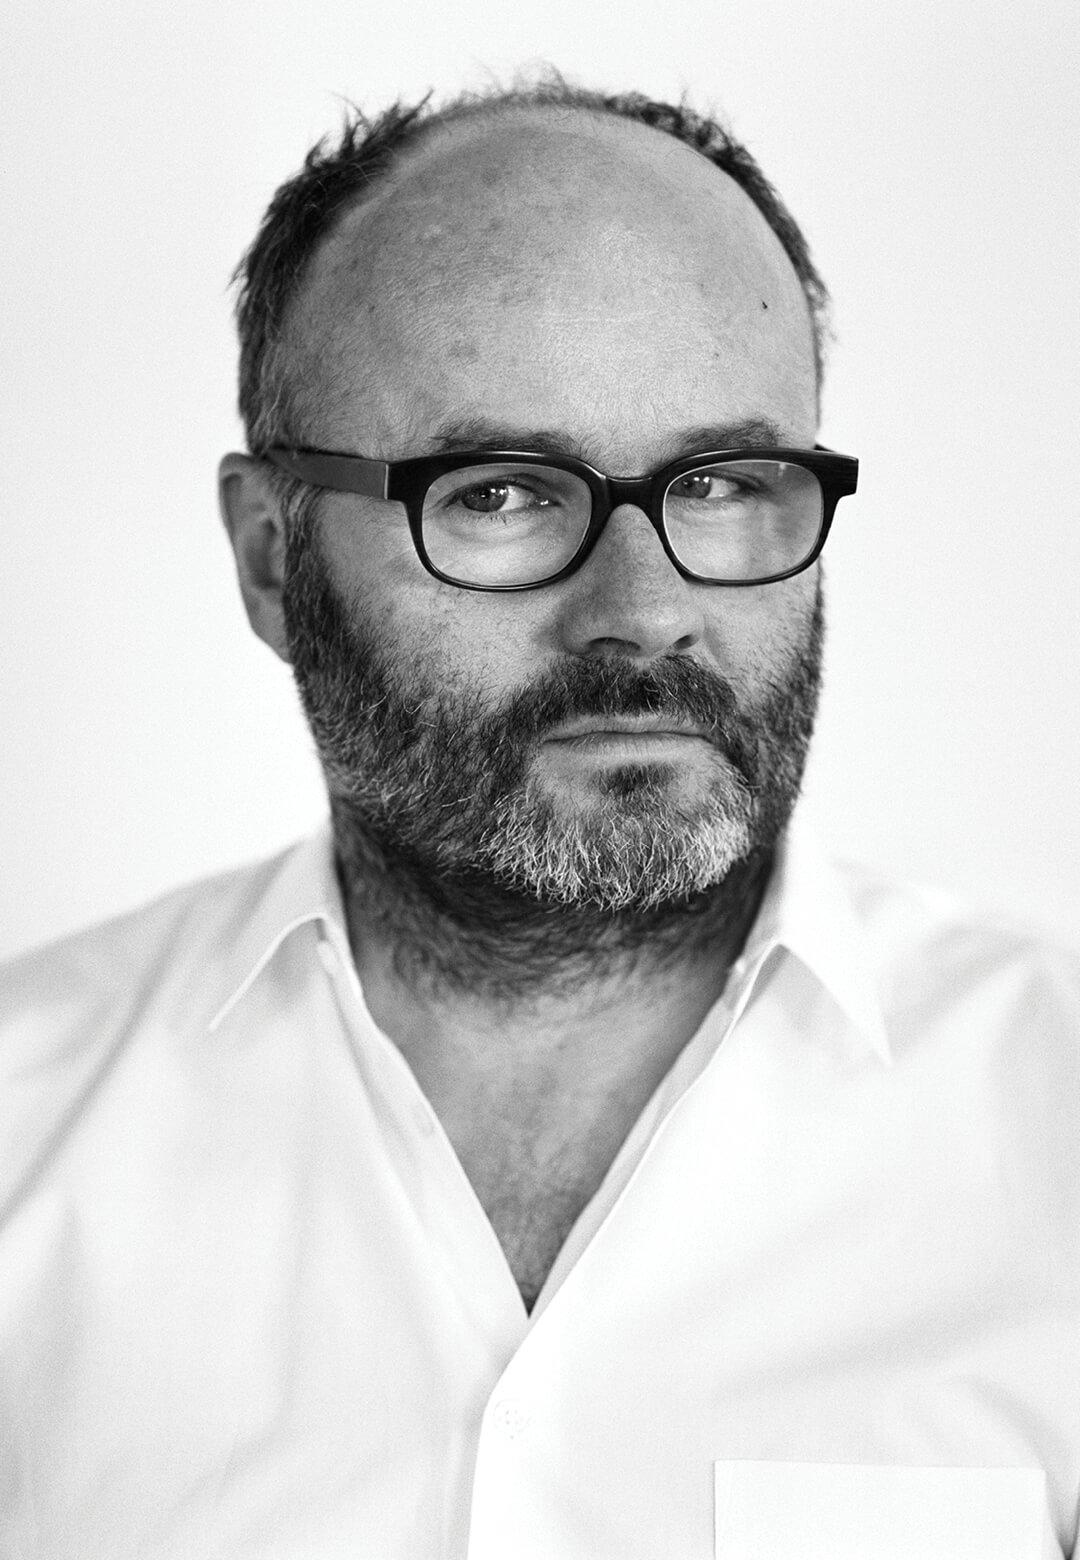 Thomas Demand, and Control Room, 2011, C-Print/ Diasec, 200 x 300 cm |Vladimir Belogolovsky interviews German artist Thomas Demand | STIRworld